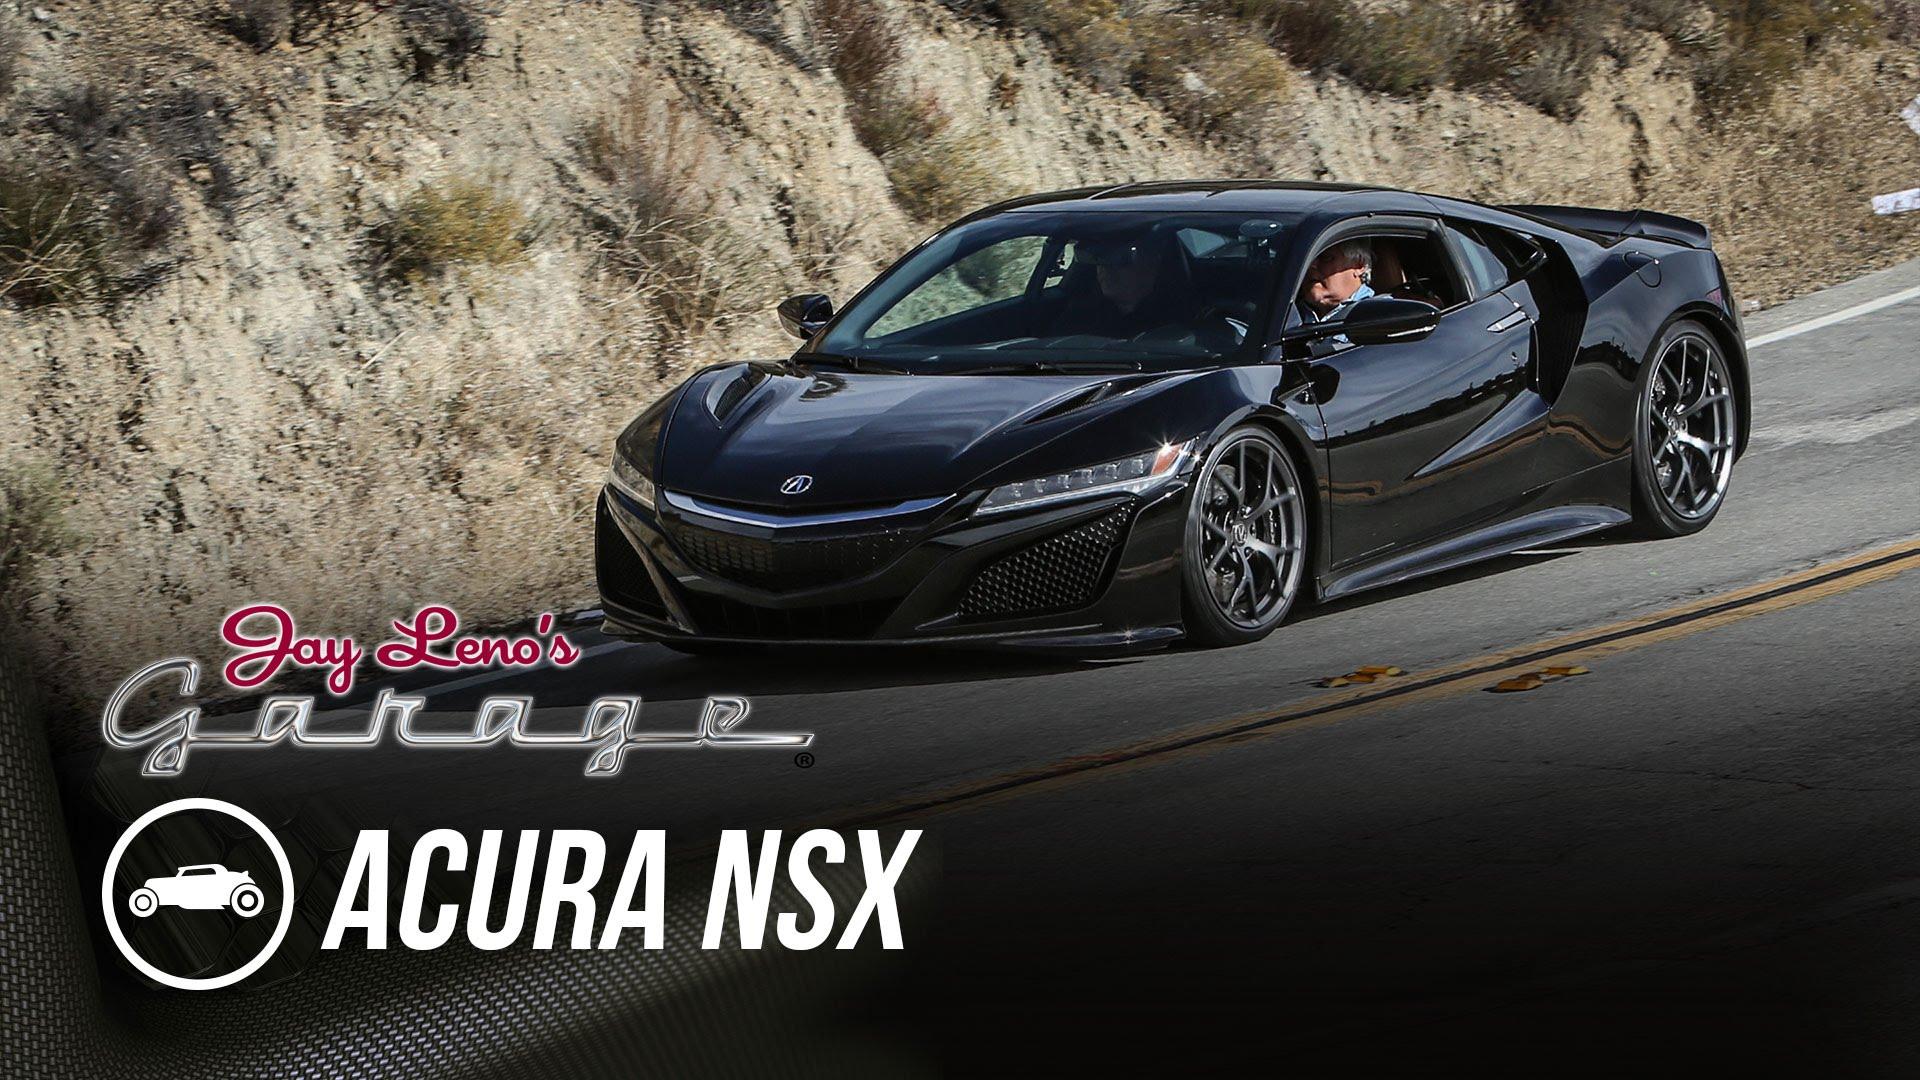 Acura NSX in Jay Leno's Garage